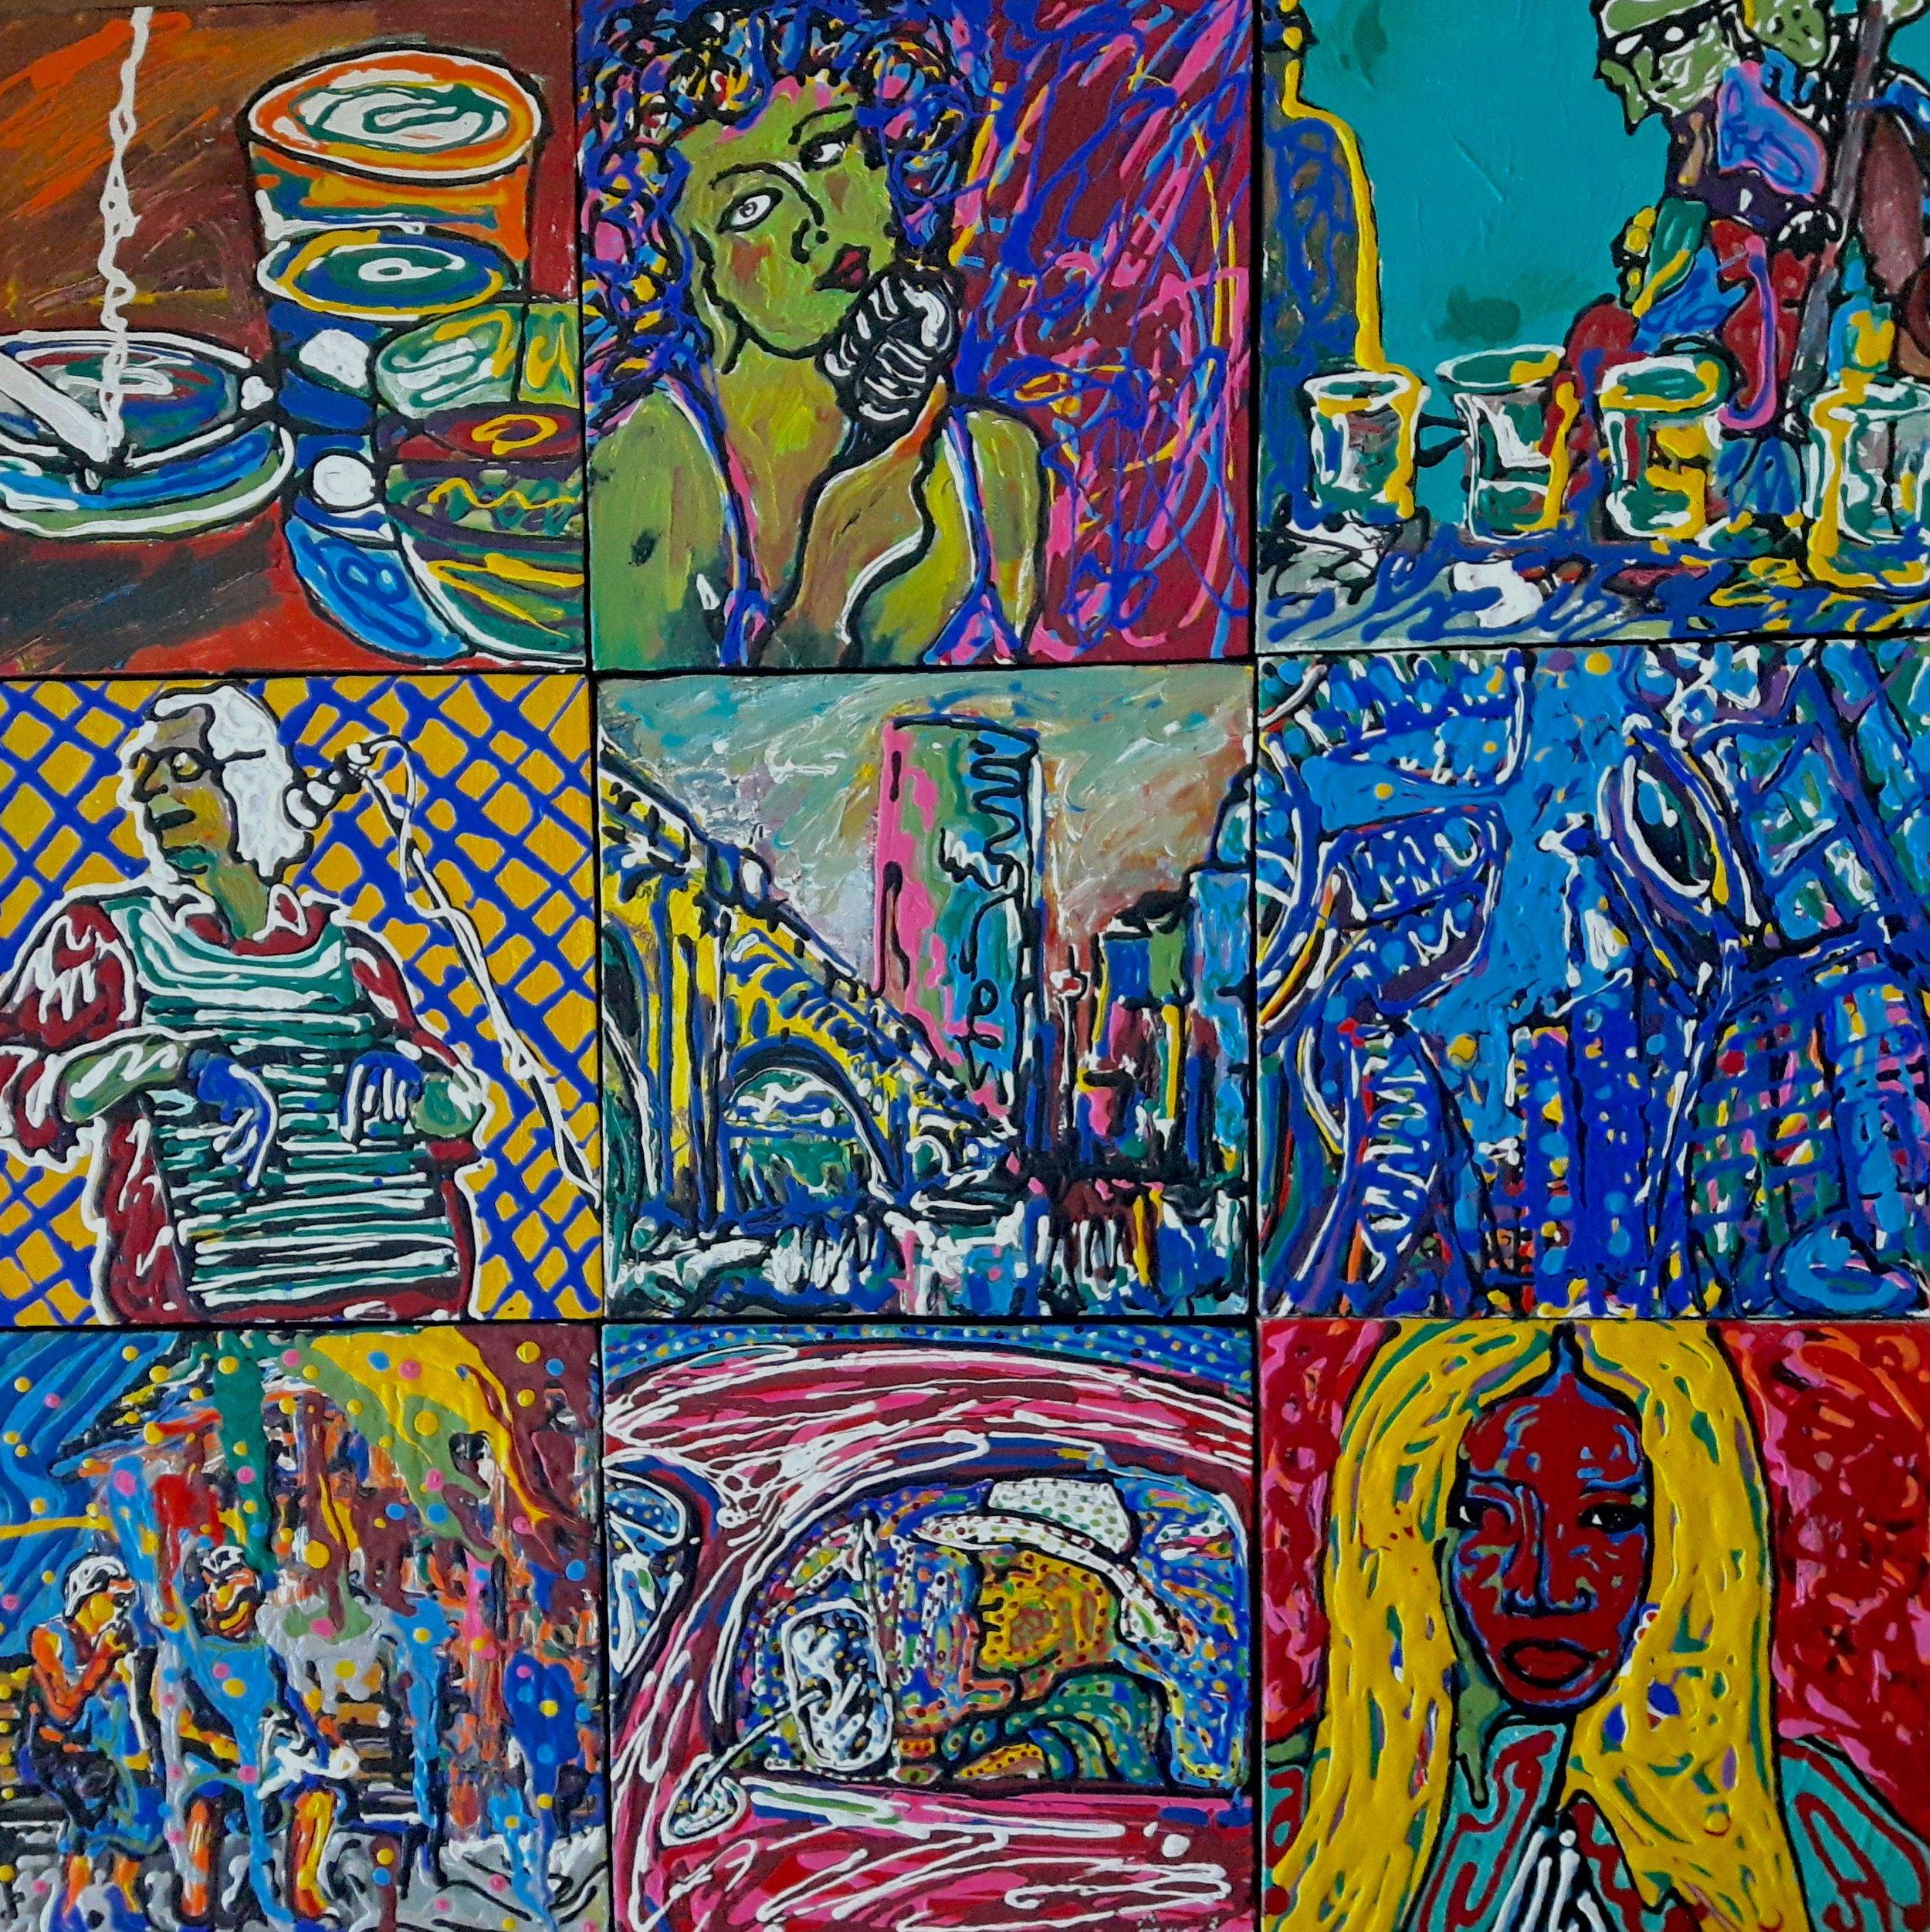 9 Days, 9-12x12 canvas panels